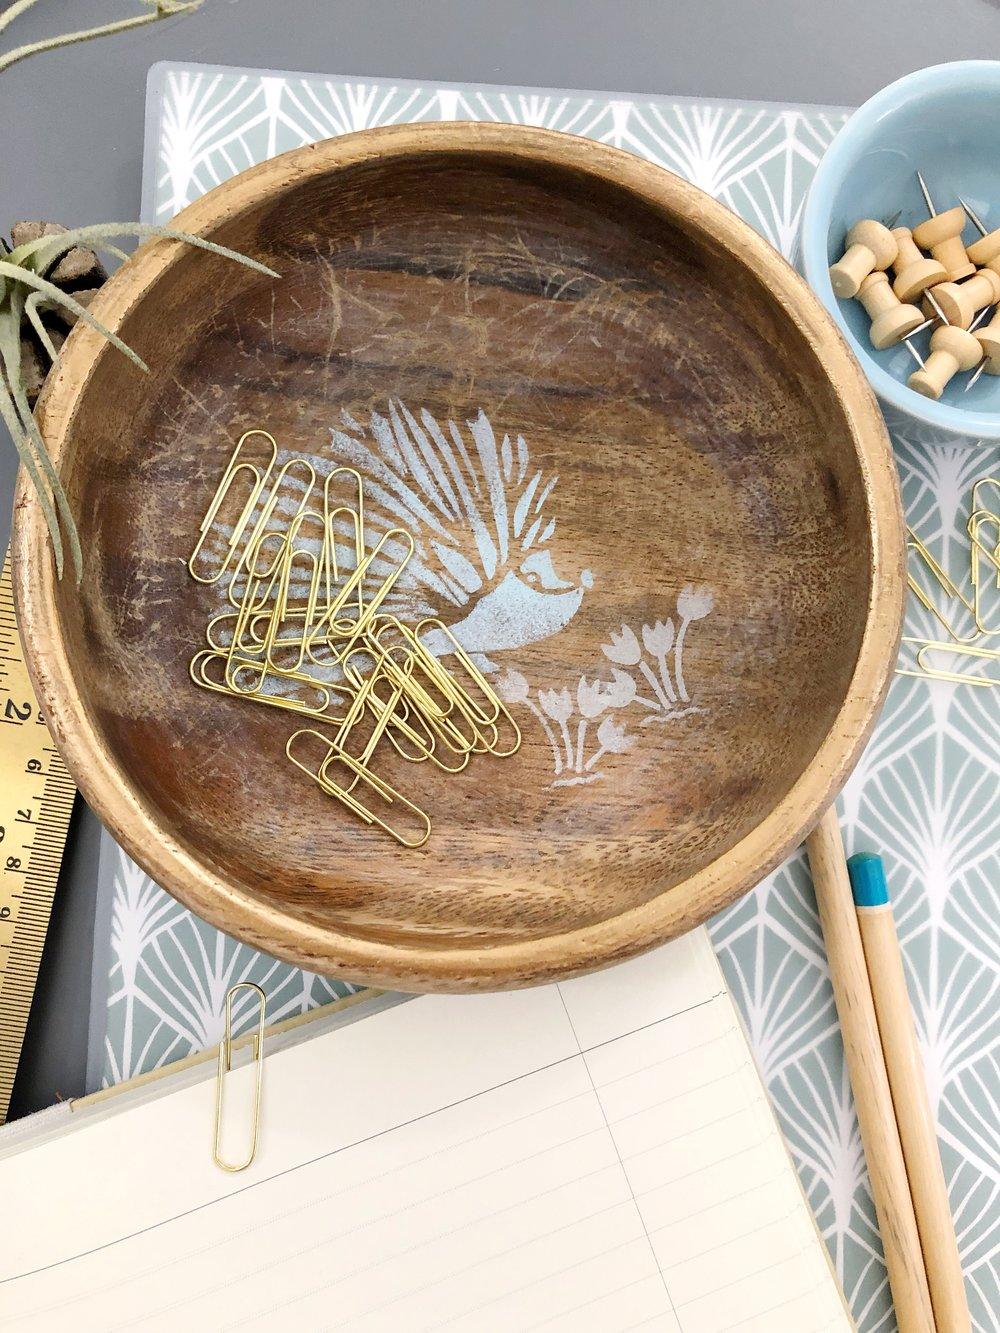 Stenciling tips for beginners. Martha Stewart adhesive stencils. Wooden Bowl up-do. #porcupine #stenciling #acrylicpaint #officesupplies #deskorganization #diy #plaidcrafts #upcycleddiy #stencilcraft #stencilproject